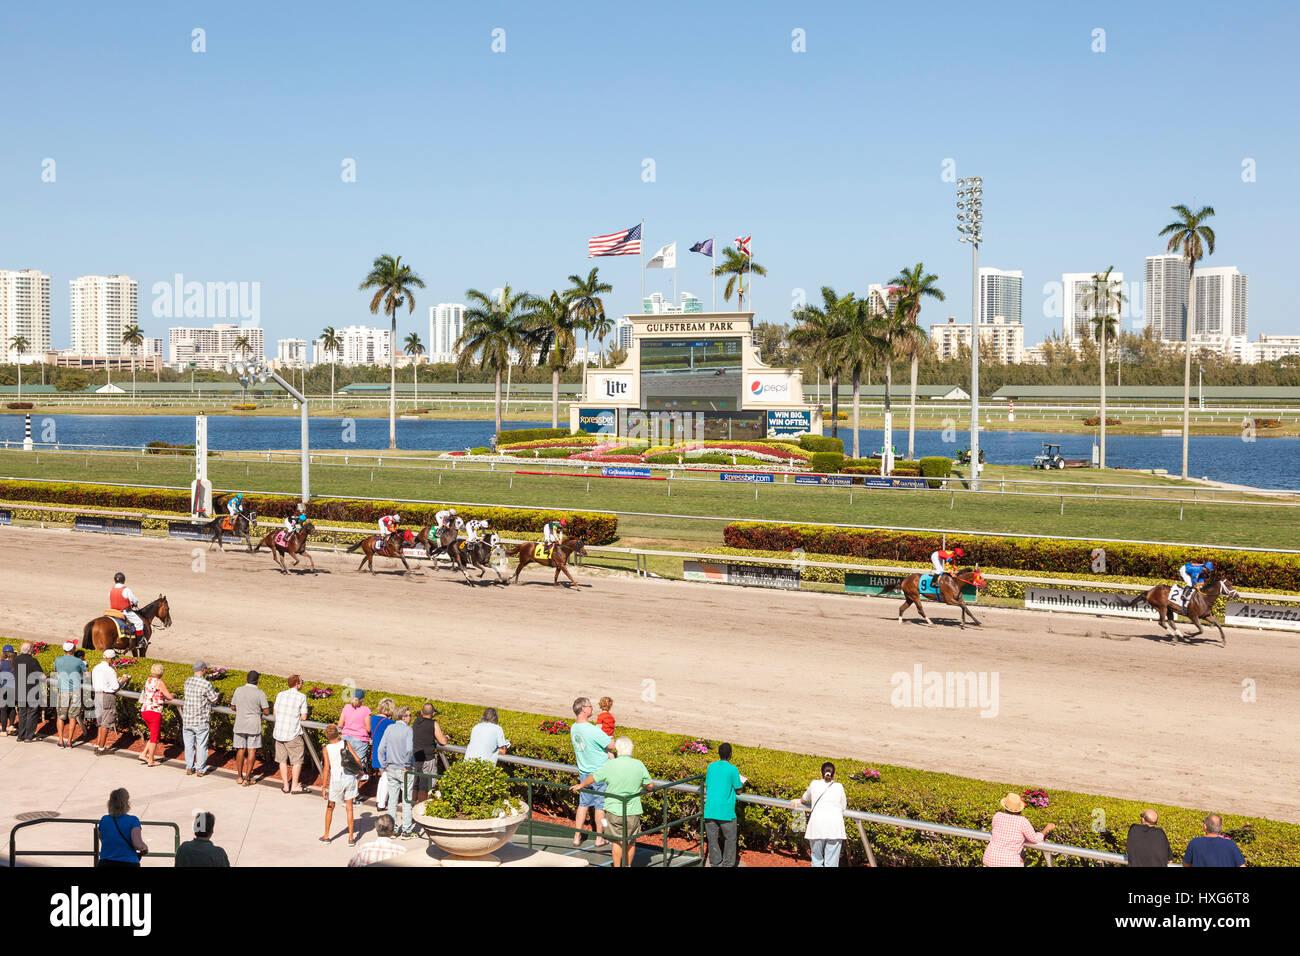 HALLANDALE BEACH, USA - MAR 11, 2017: Horse racing at the Gulfstream Park race track in Hallandale Beach, Florida, - Stock Image